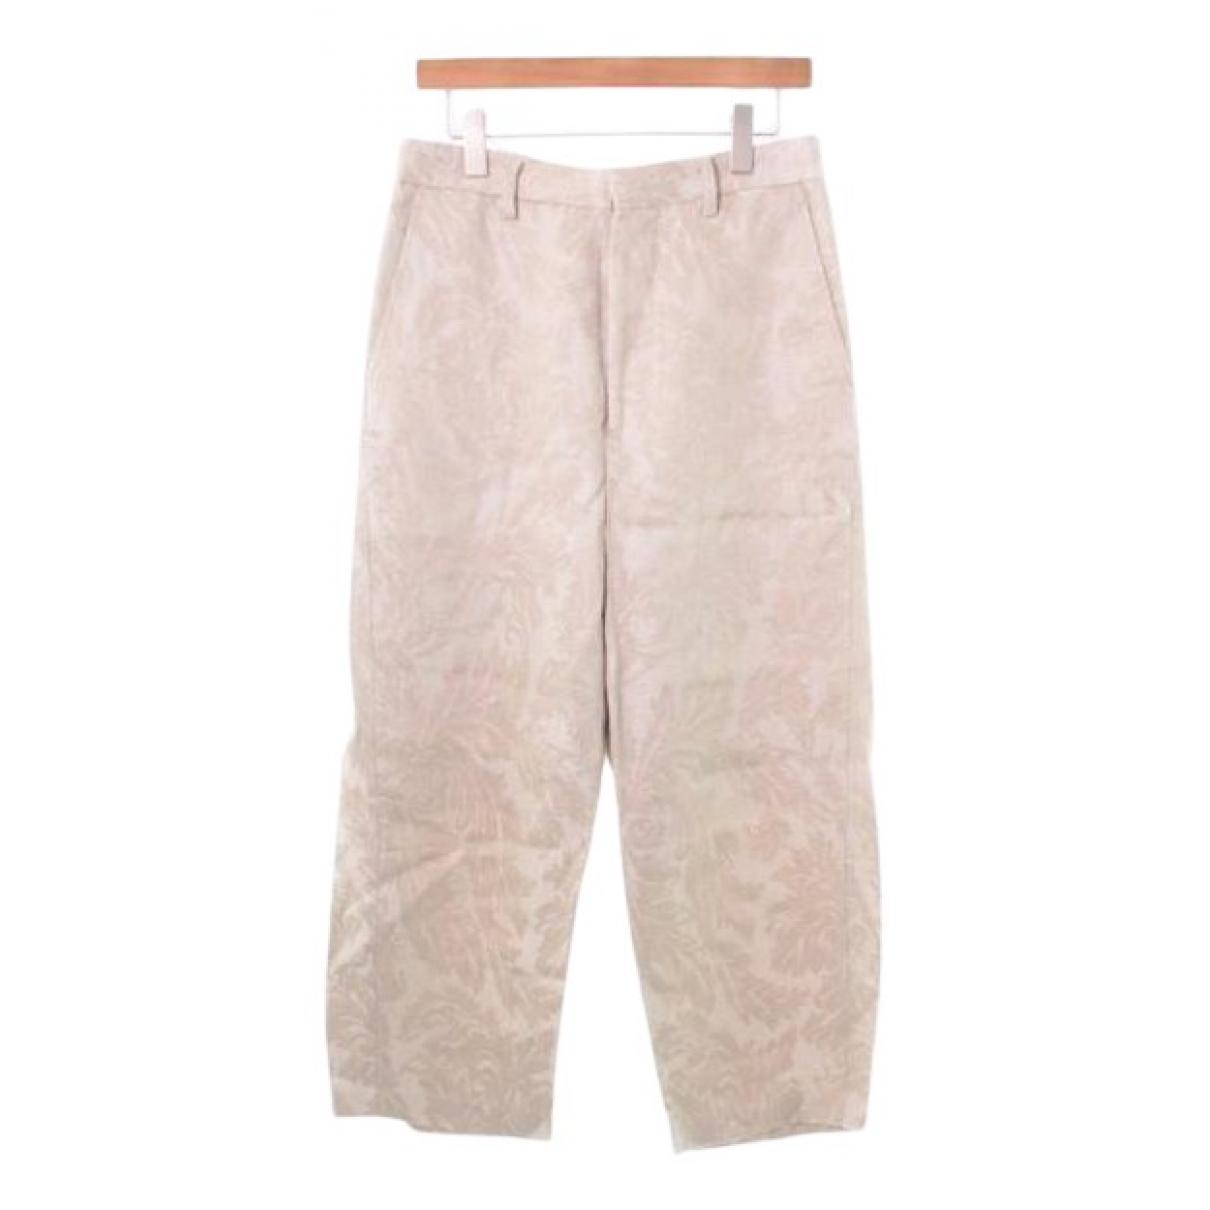 Comme Des Garcons N Beige Cotton Trousers for Women S International